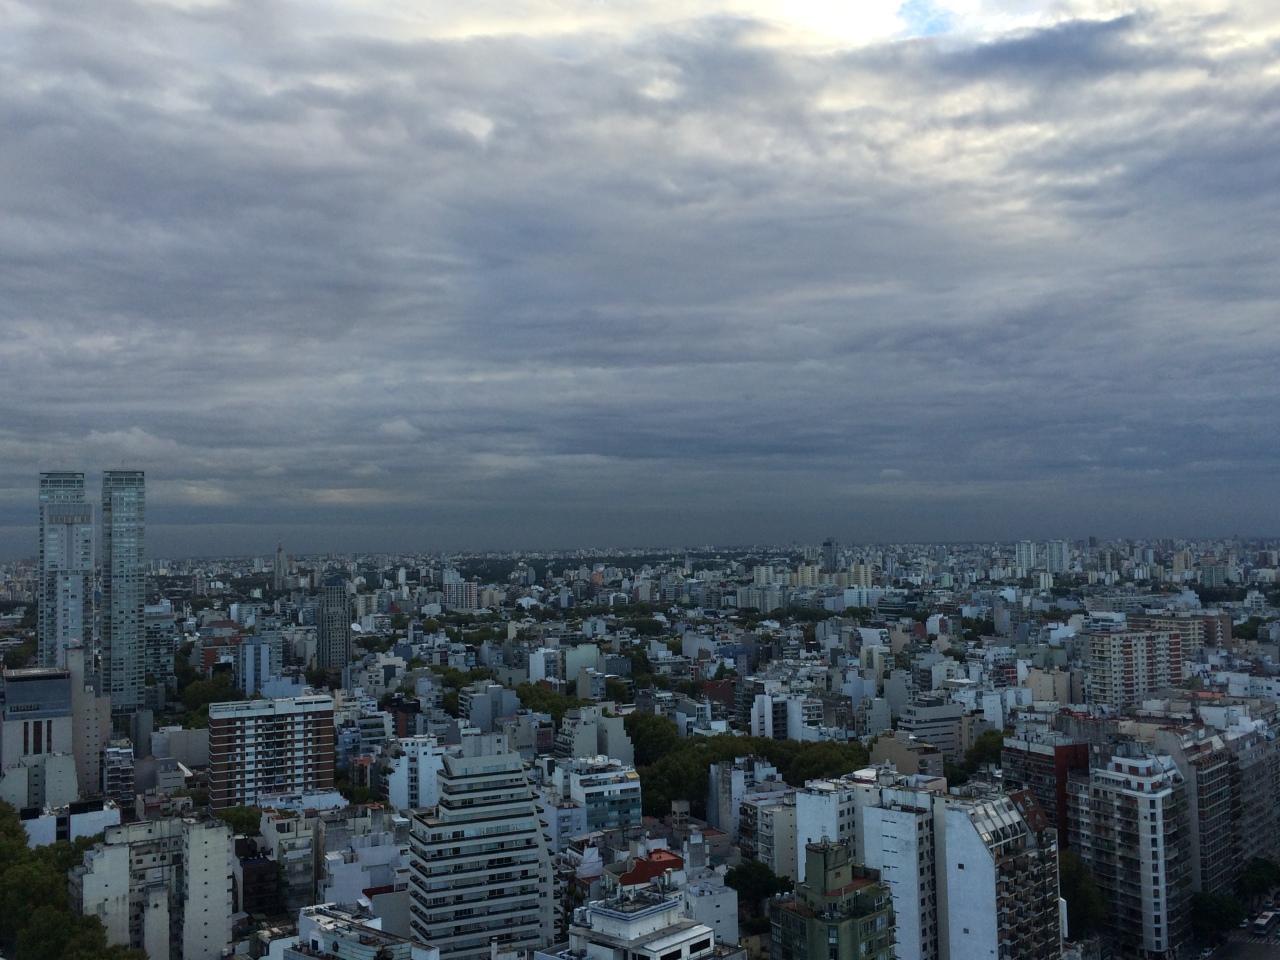 City Scenes: BuenosAires